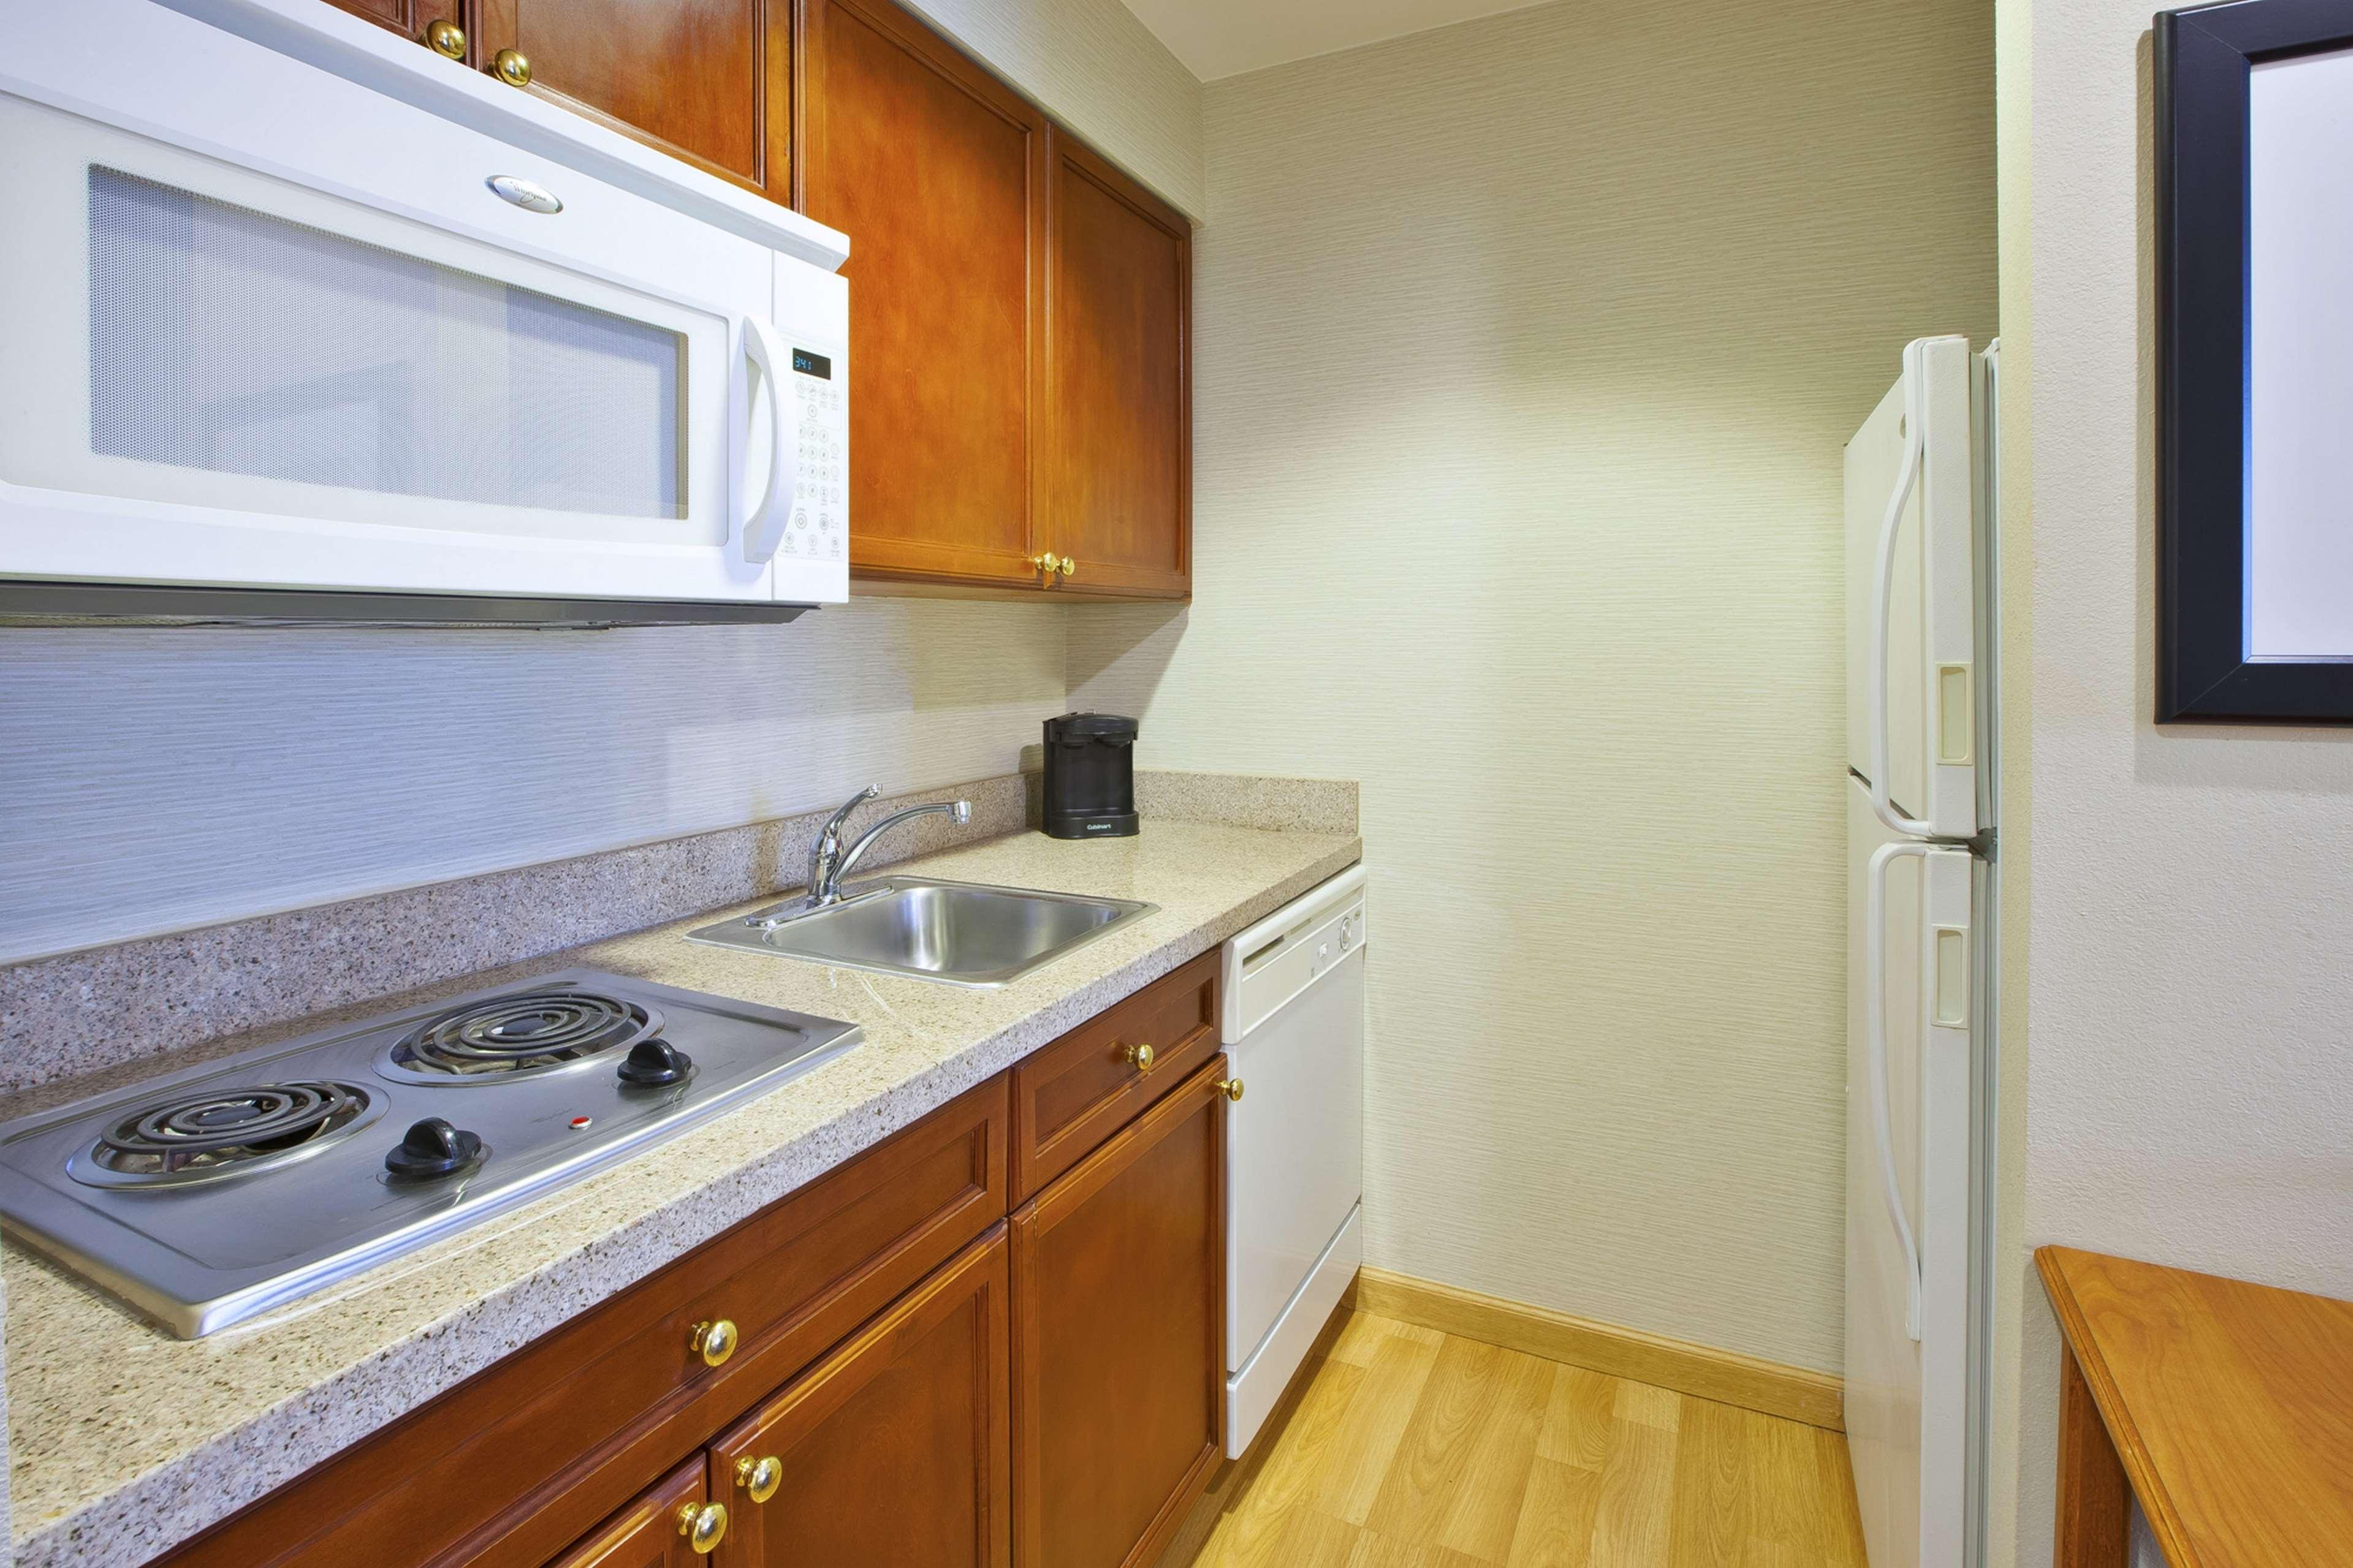 Homewood Suites by Hilton Philadelphia/Mt. Laurel image 13